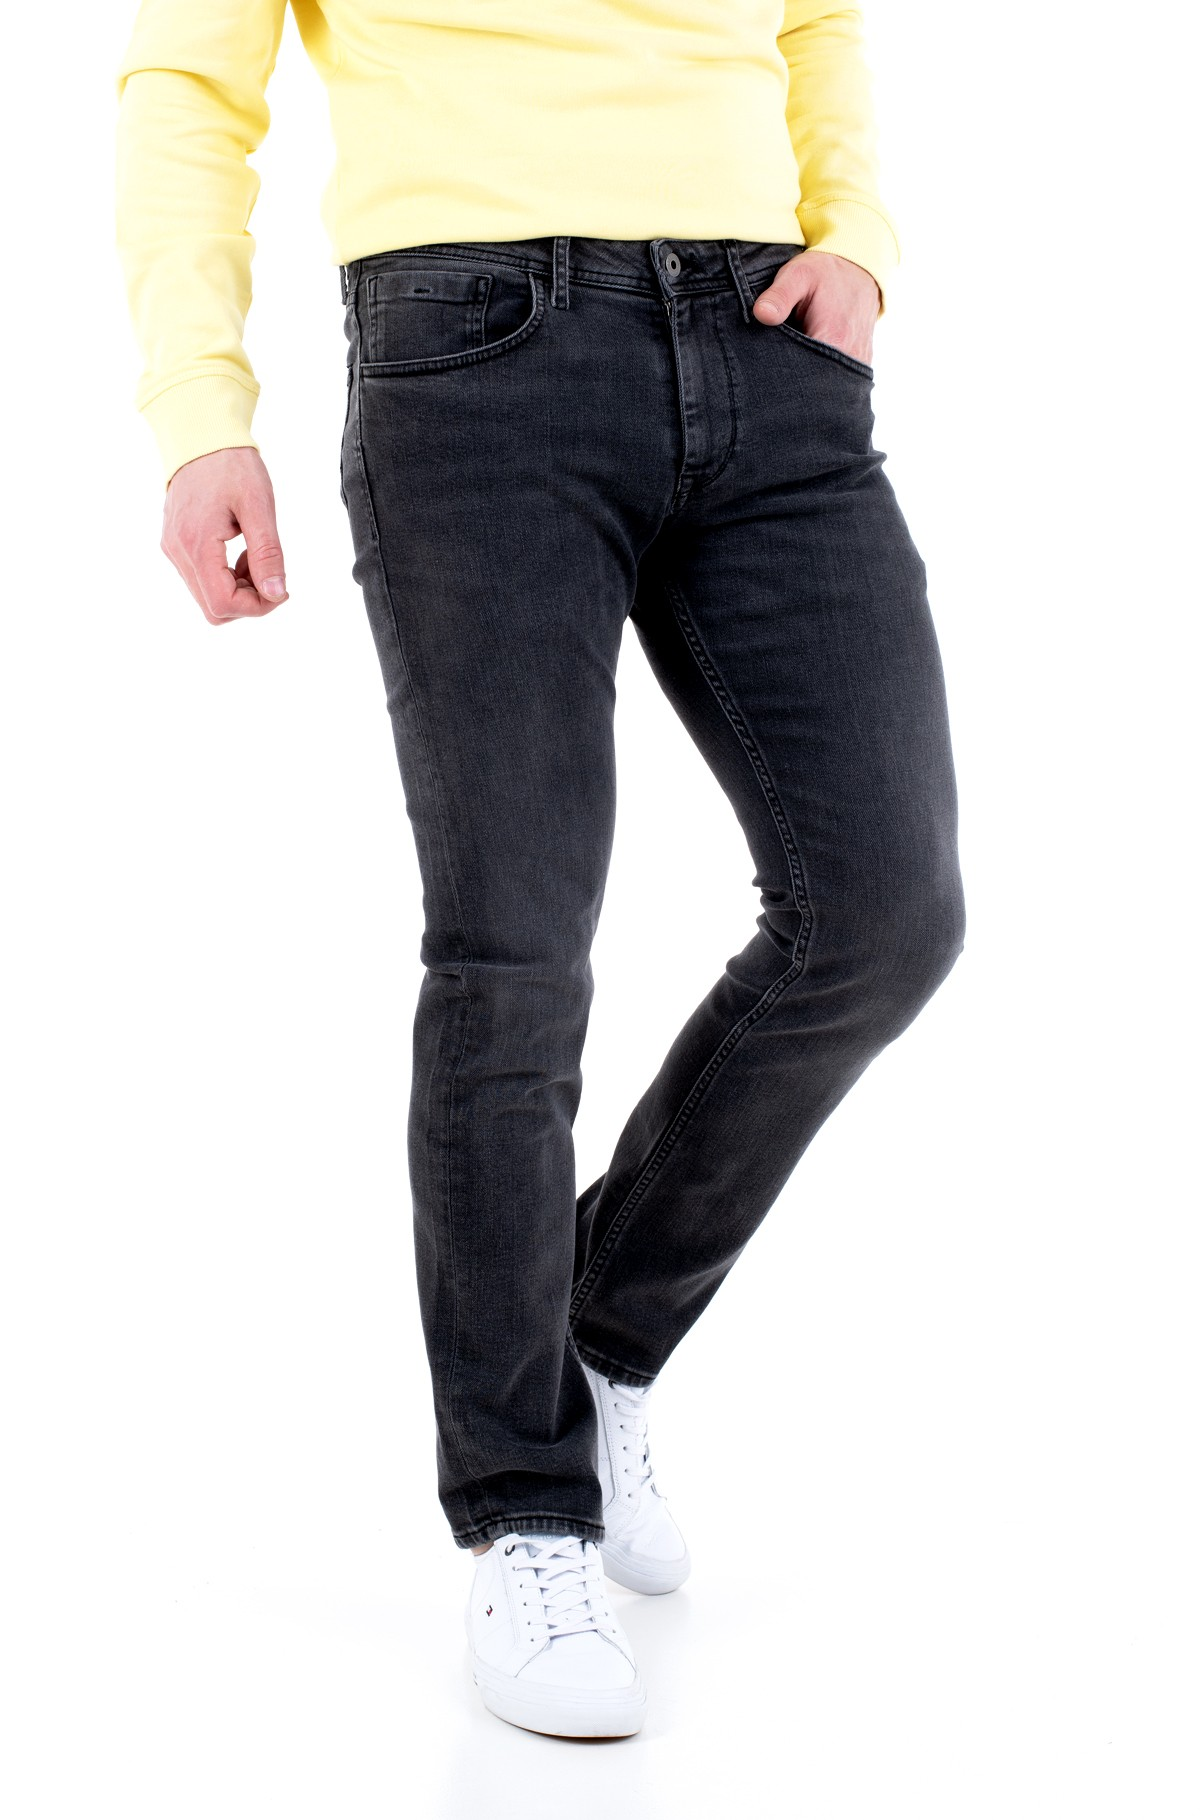 Jeans CASH 5PKT/PM205210EC3-full-1